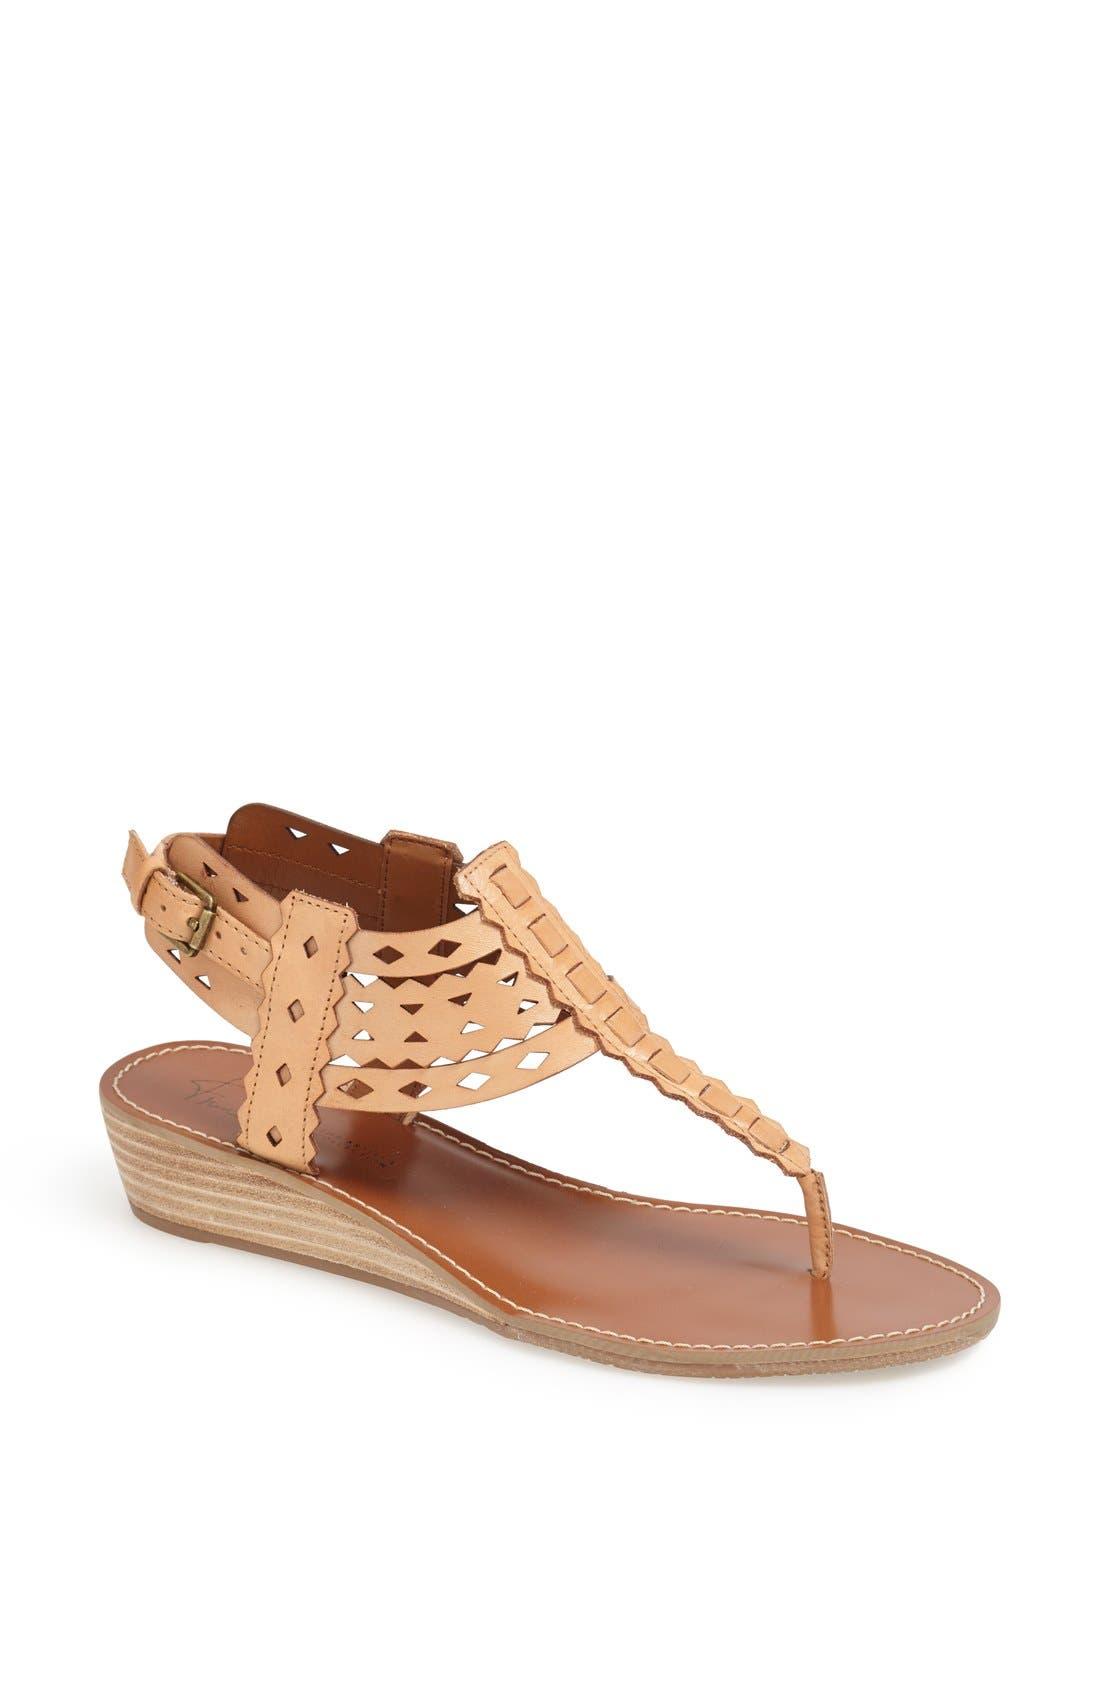 Main Image - Franco Sarto 'Cascade' Sandal